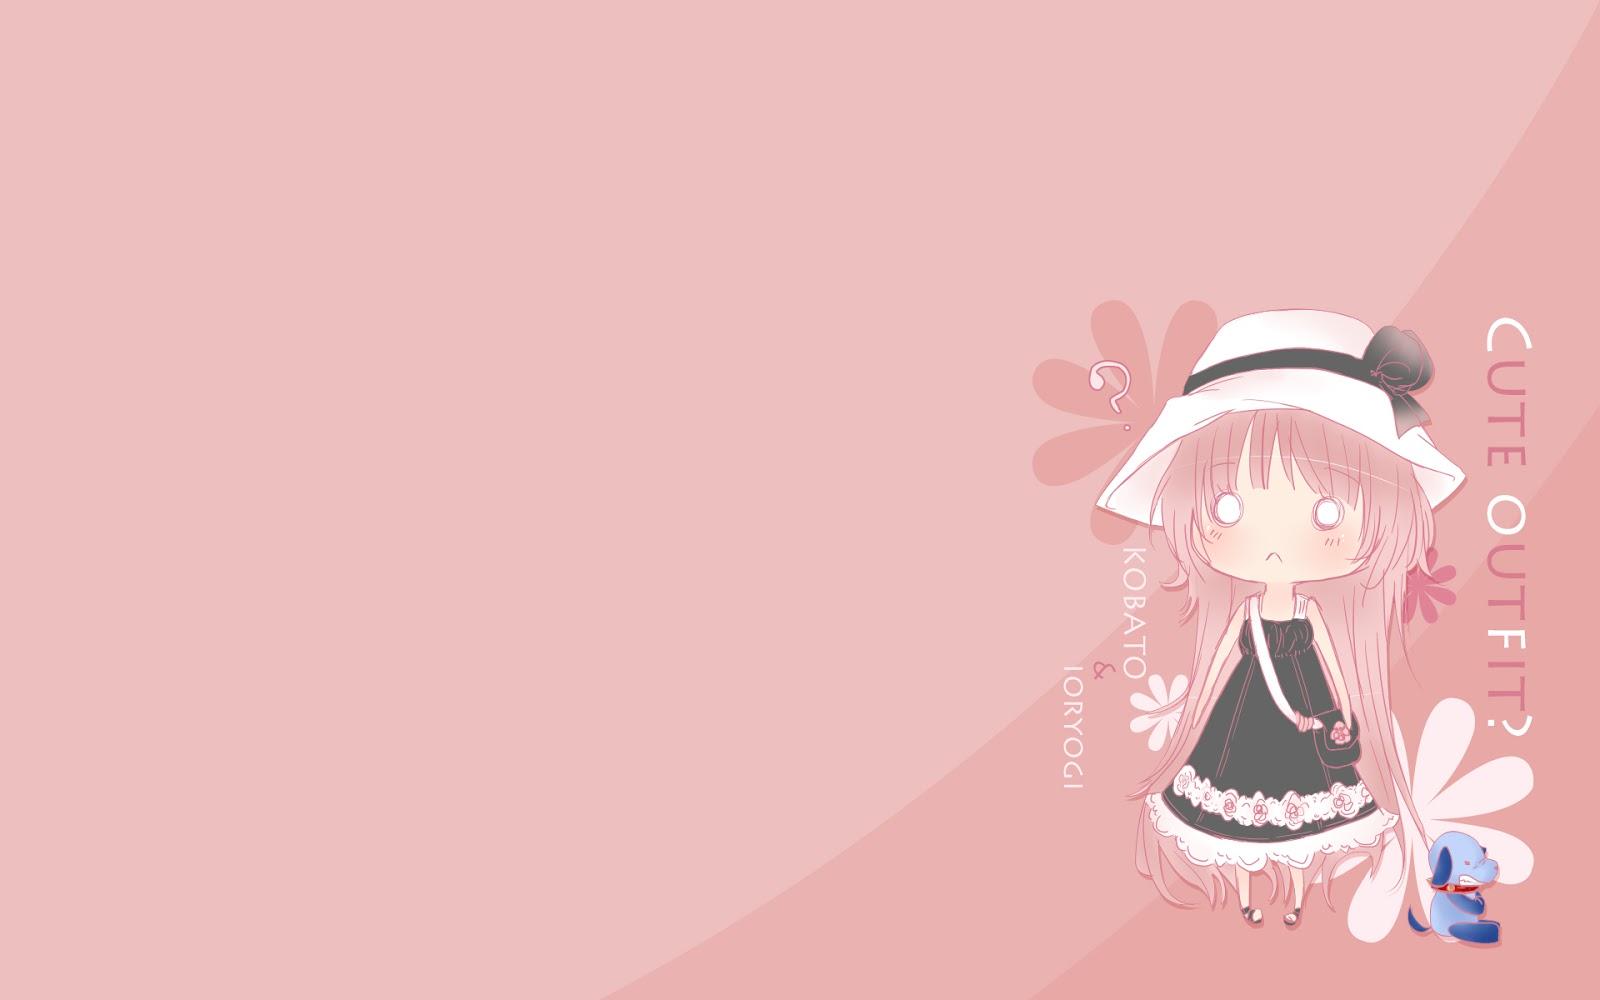 http://1.bp.blogspot.com/-uZBBzfzQqAY/T6pWBFt4VyI/AAAAAAAAAF8/_h56GkiZc1M/s1600/35+-+hanato_kobato+ioryogi+kobato+pink+wallpaper.jpg